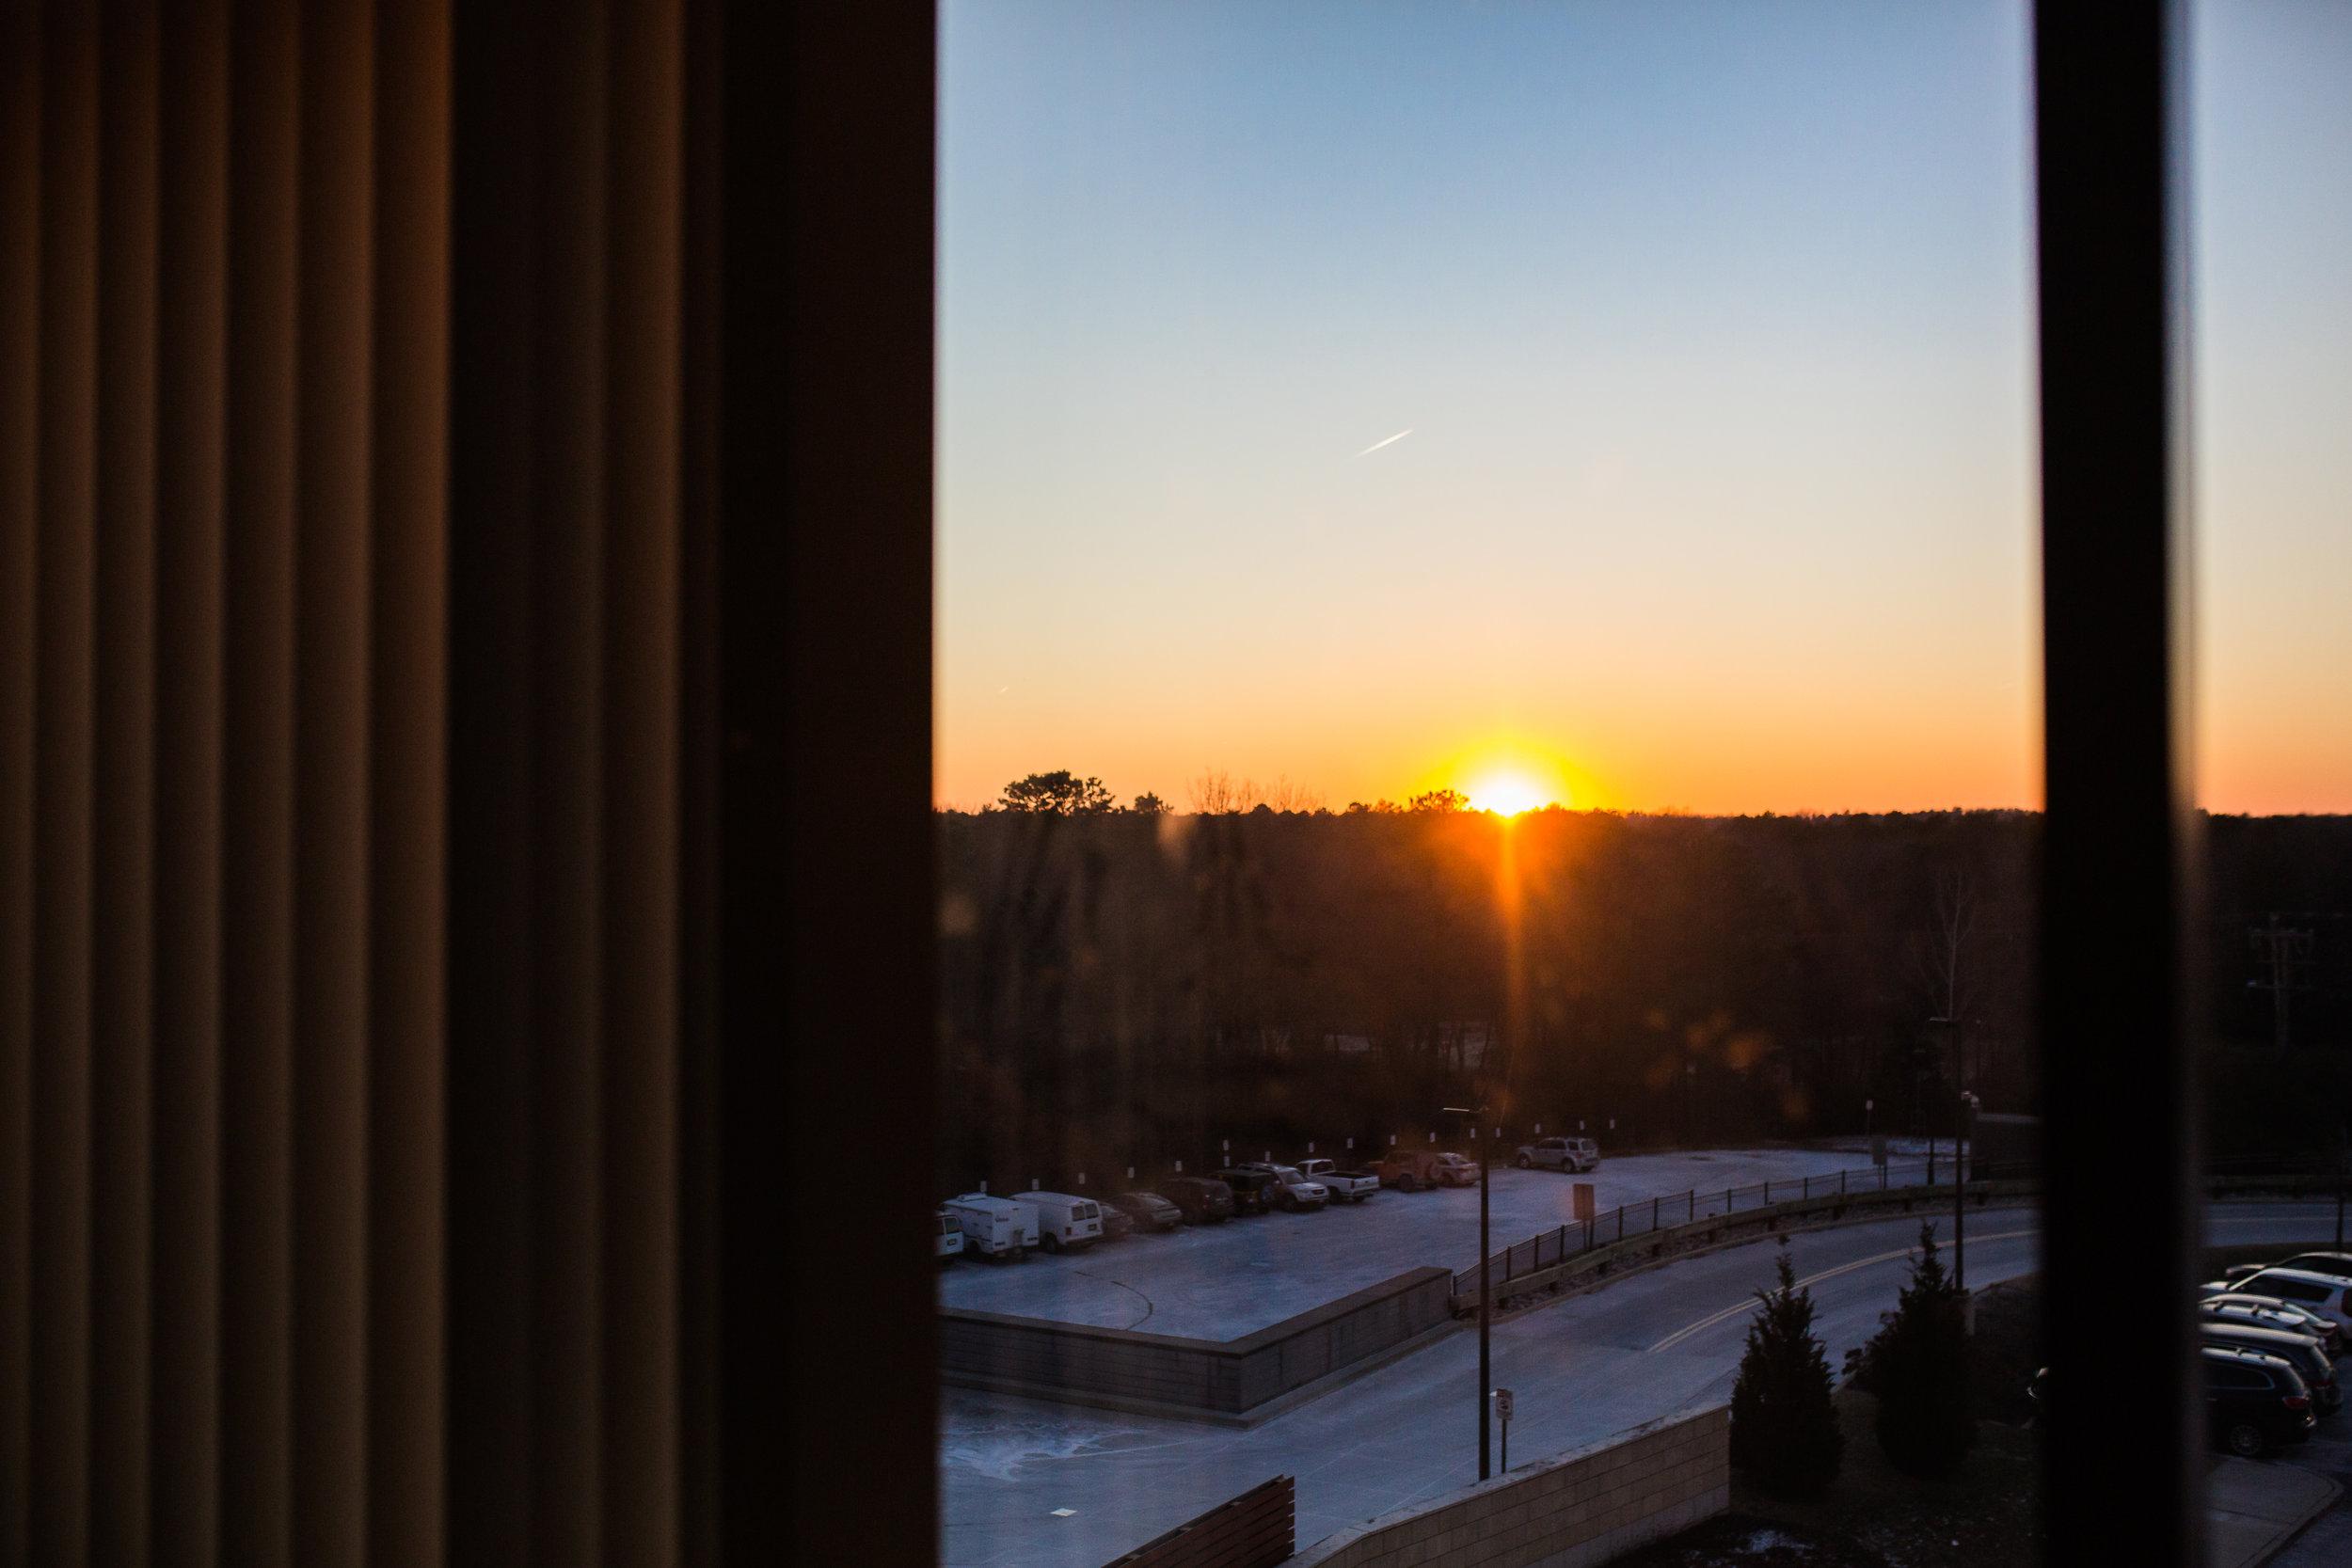 sun setting through hosipital window